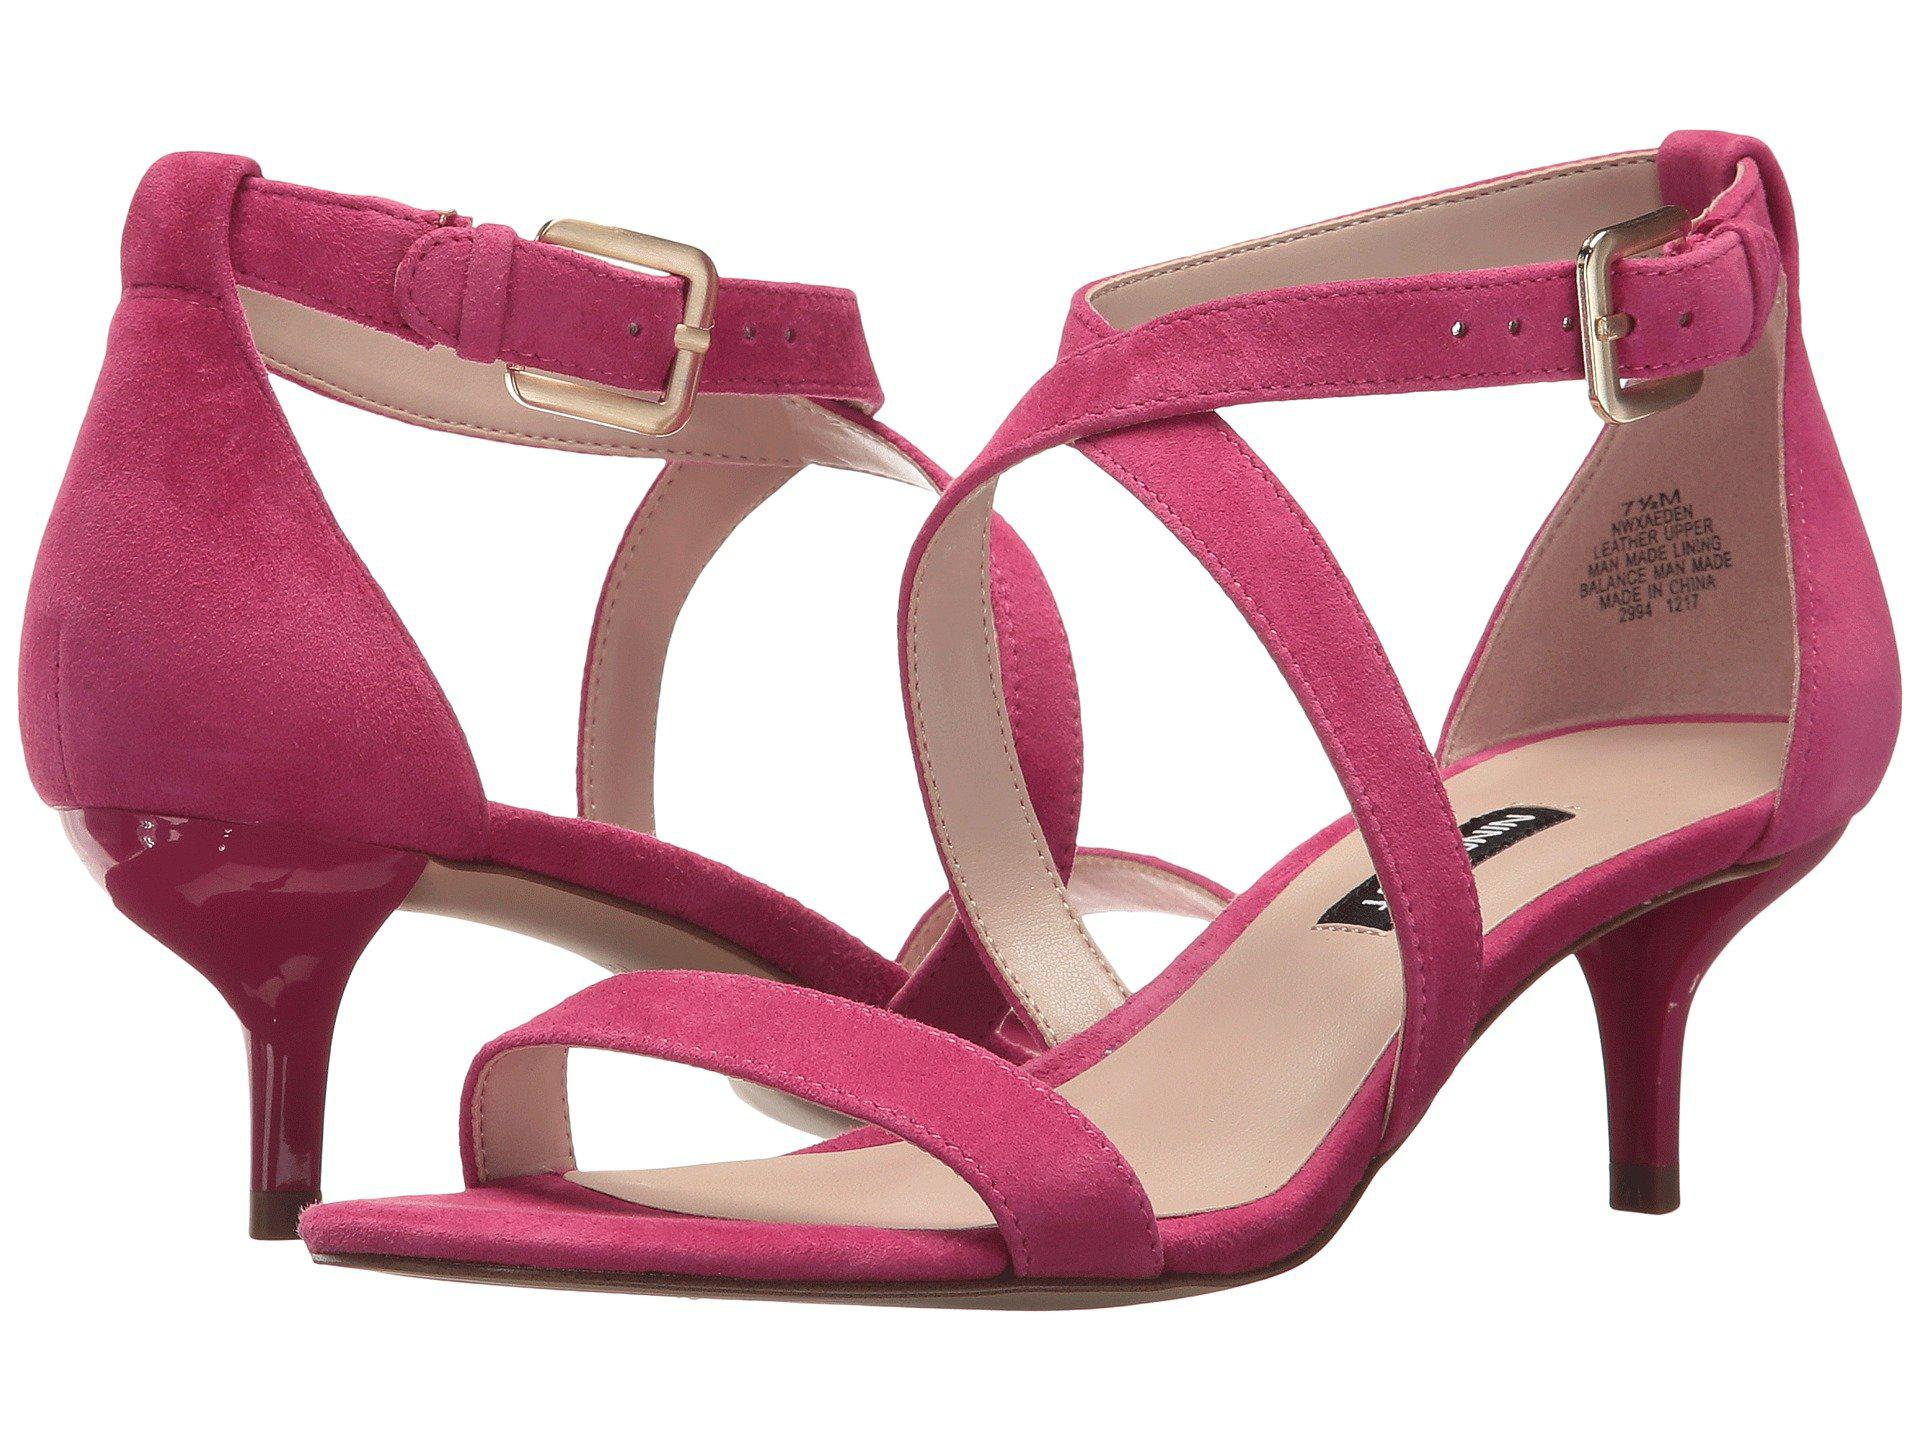 2ffc5bf45483 Lyst - Nine West Xaeden Strappy Heel Sandal in Pink - Save 15%